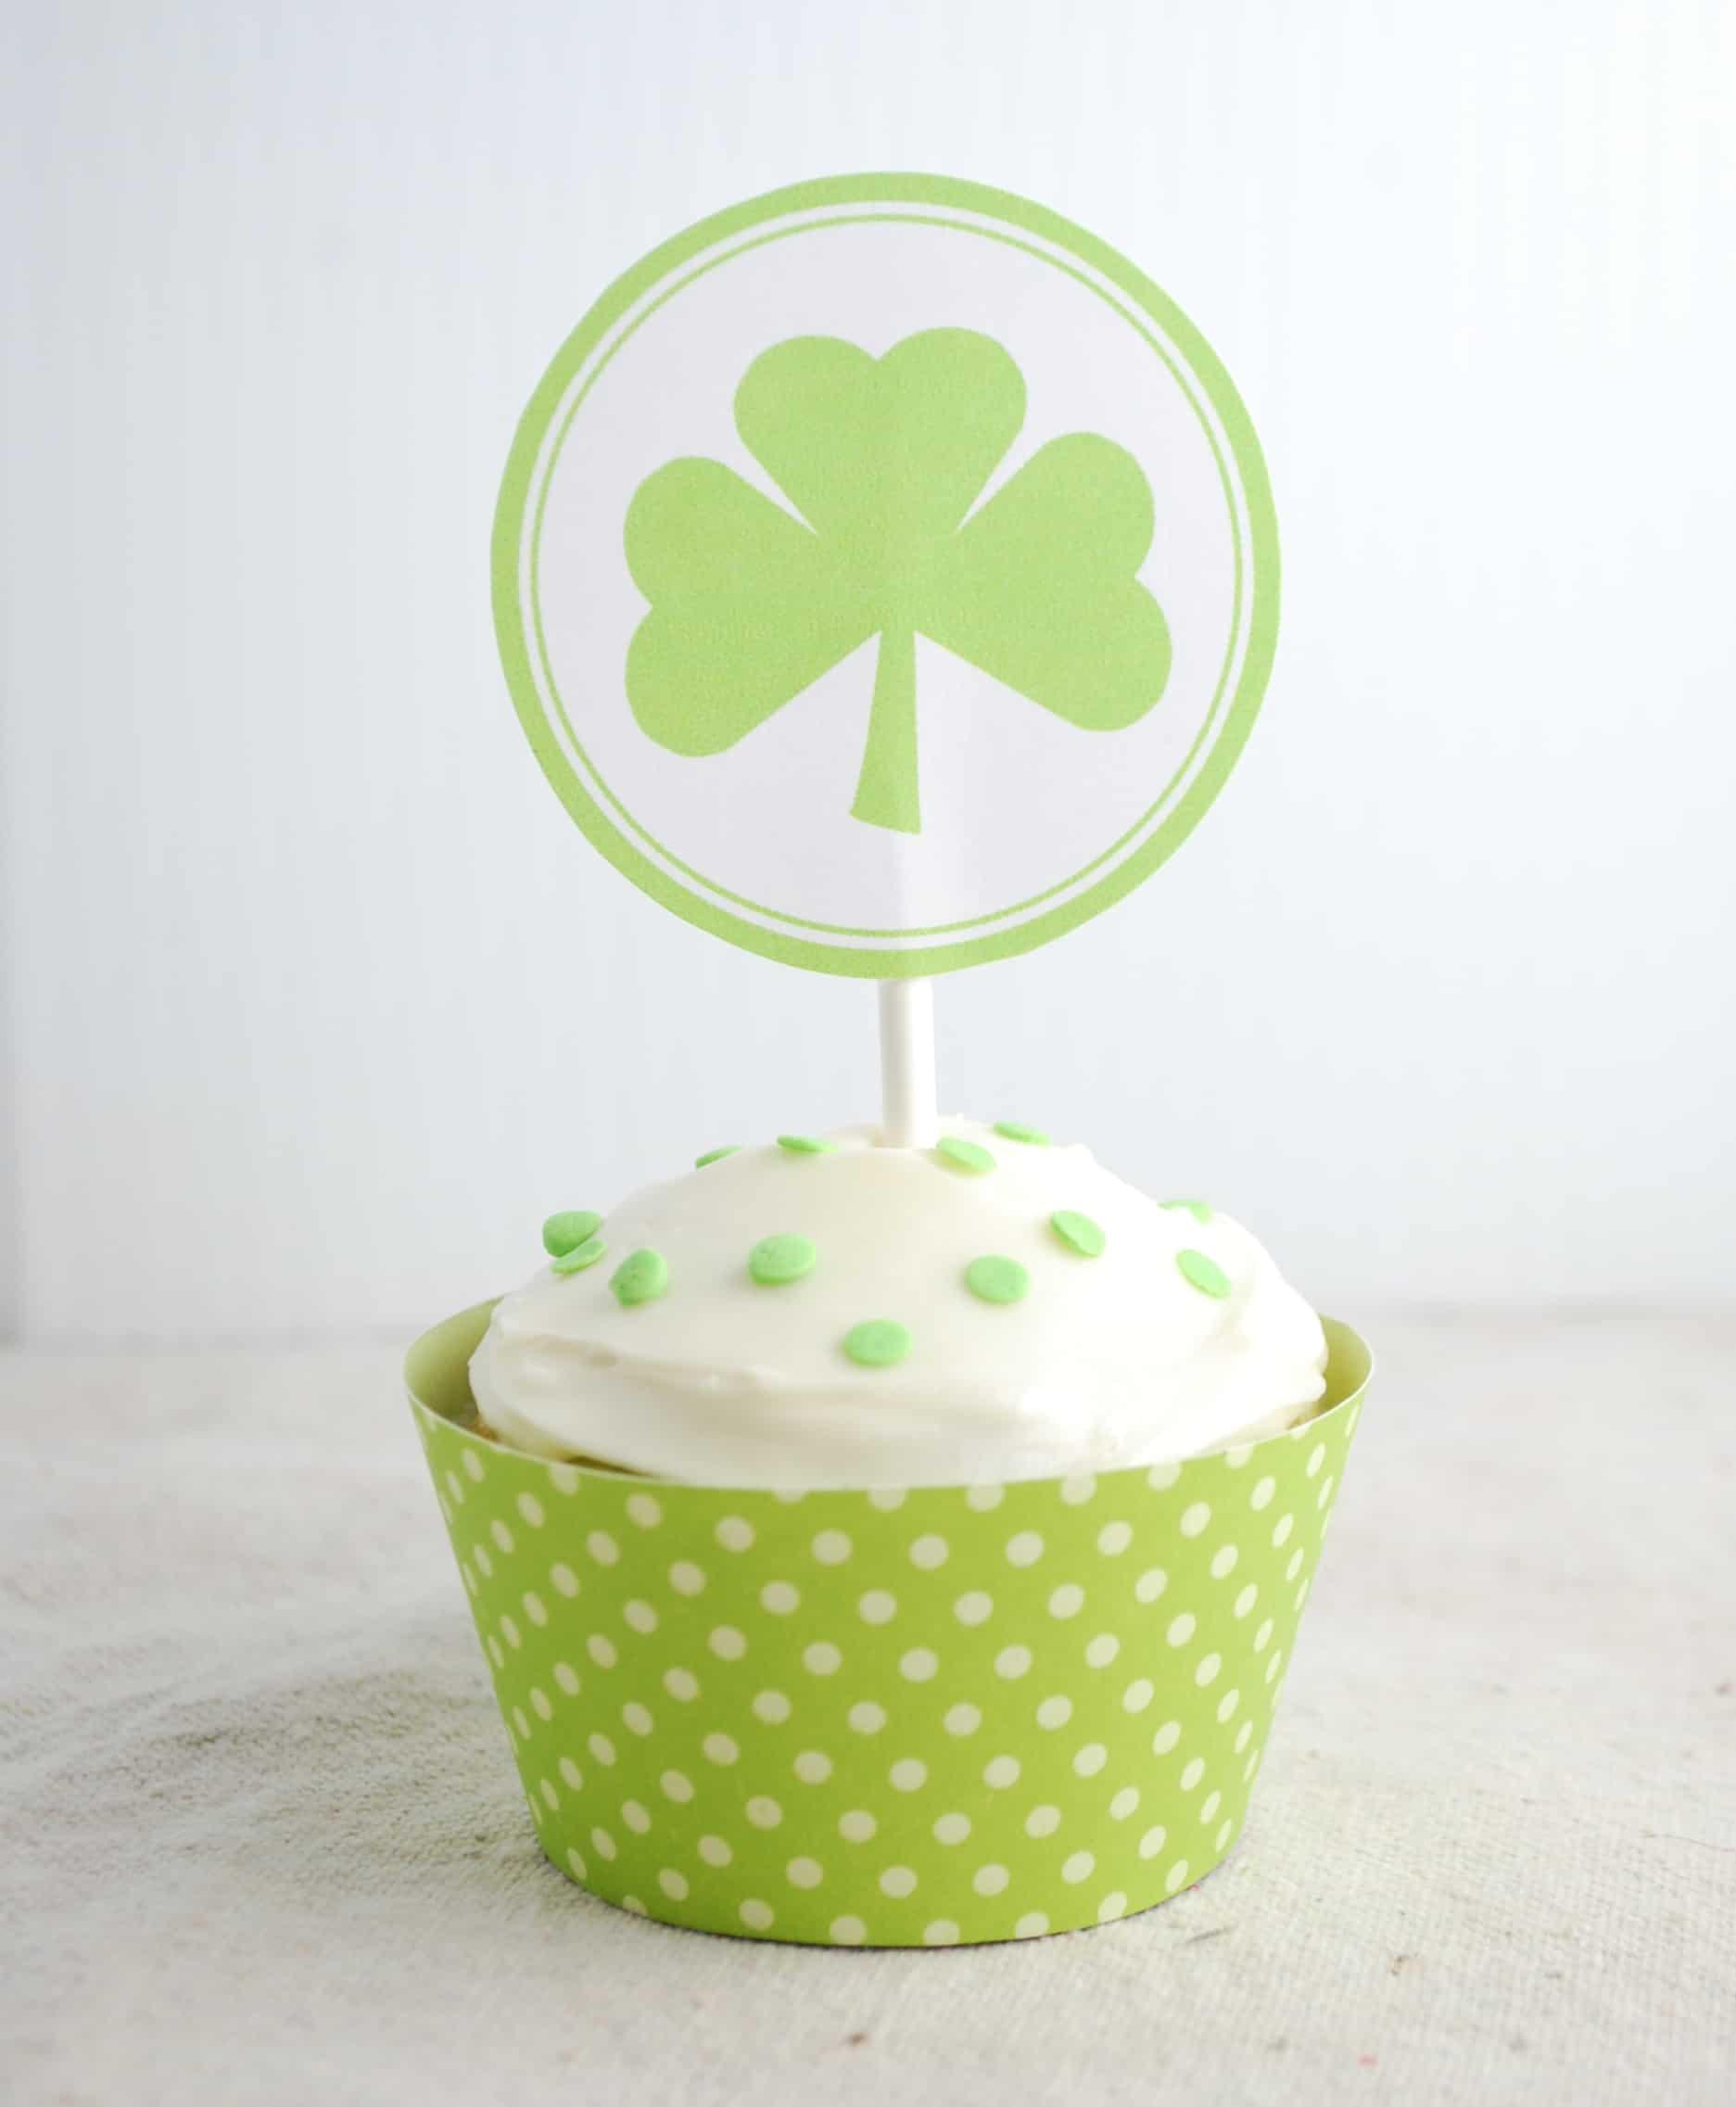 St. Patrick's recipe